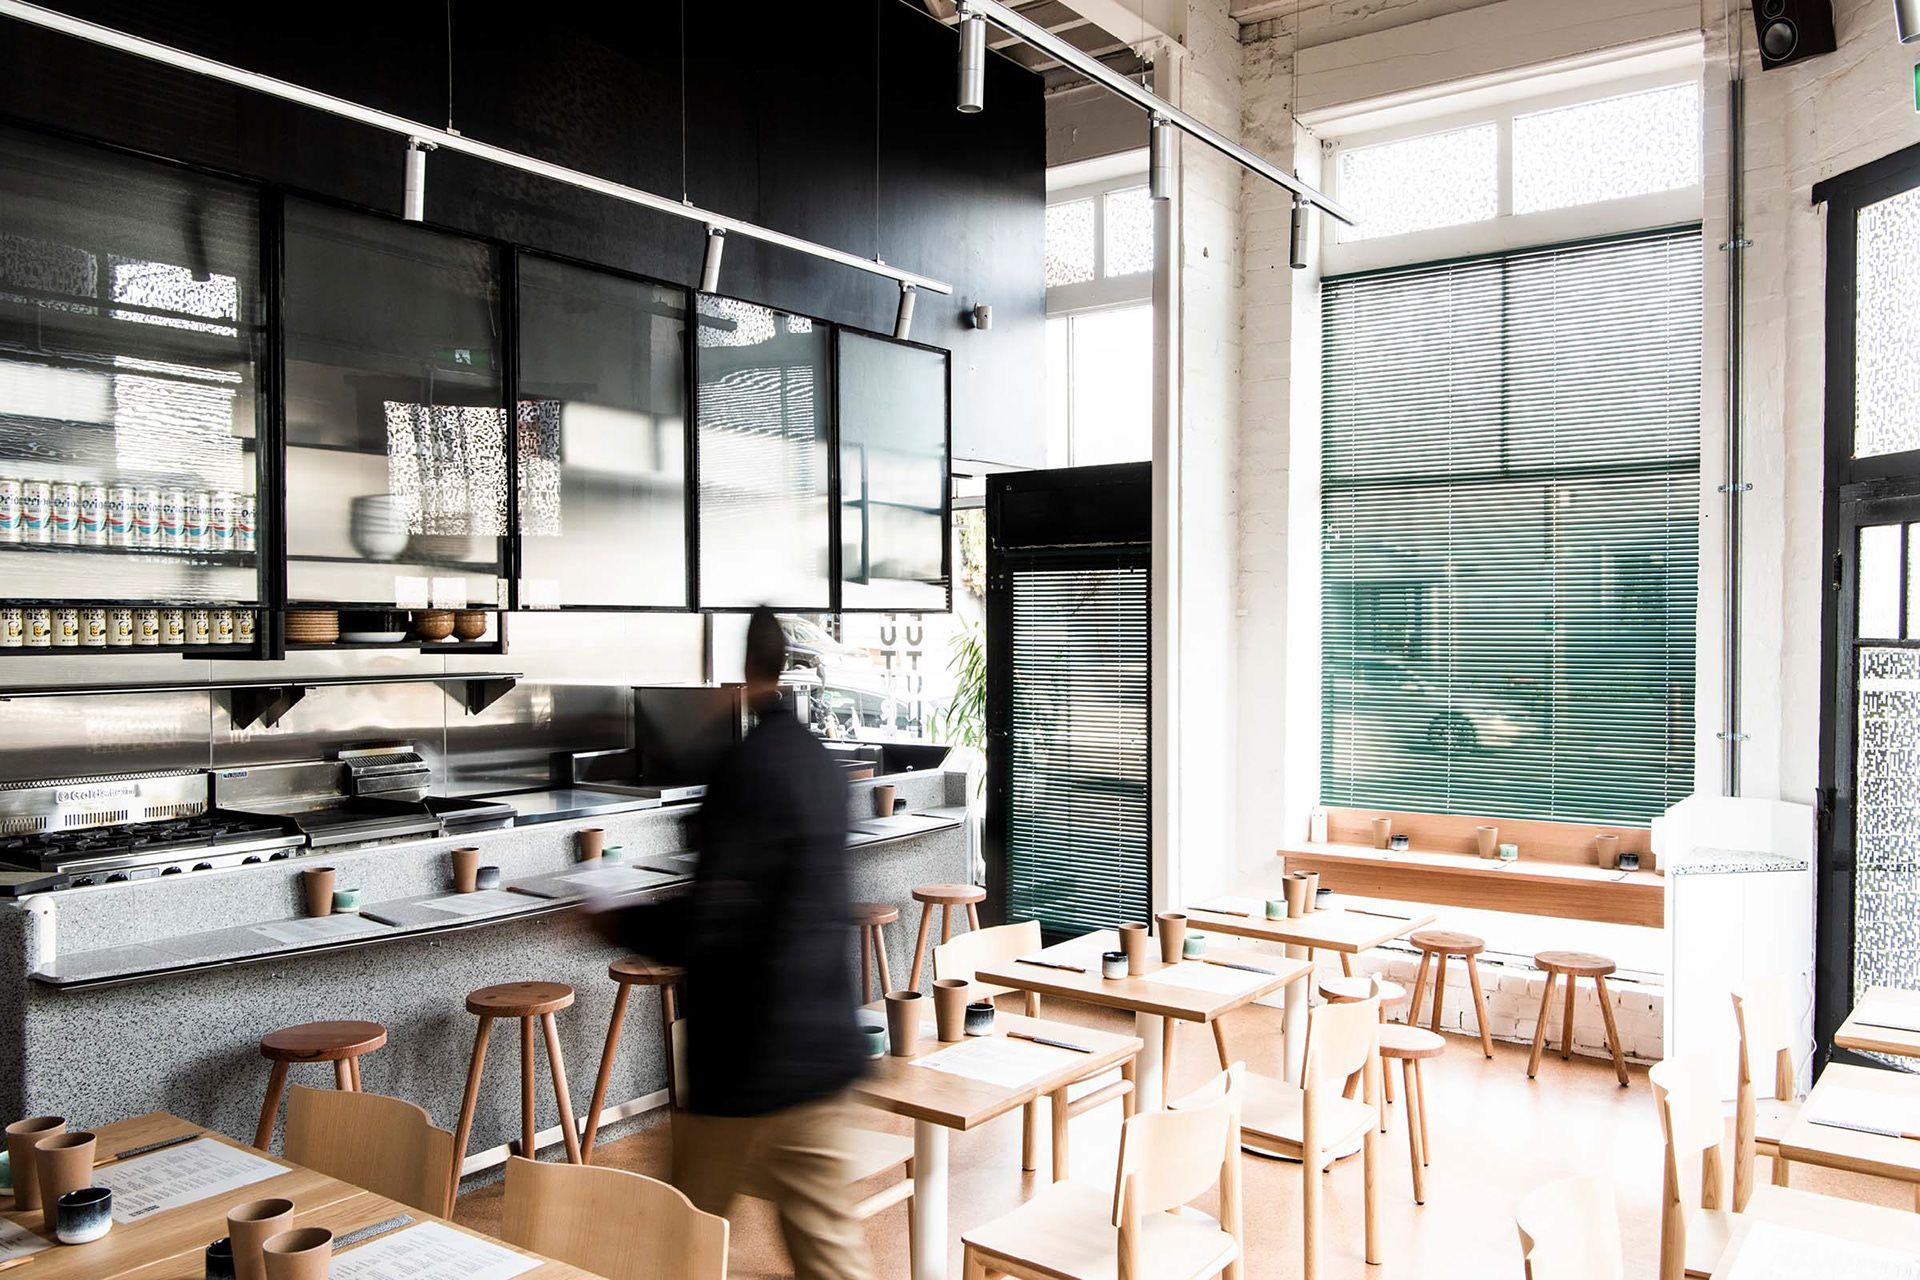 pin by huei tai chen on storedeco in 2018 design design rh pinterest com